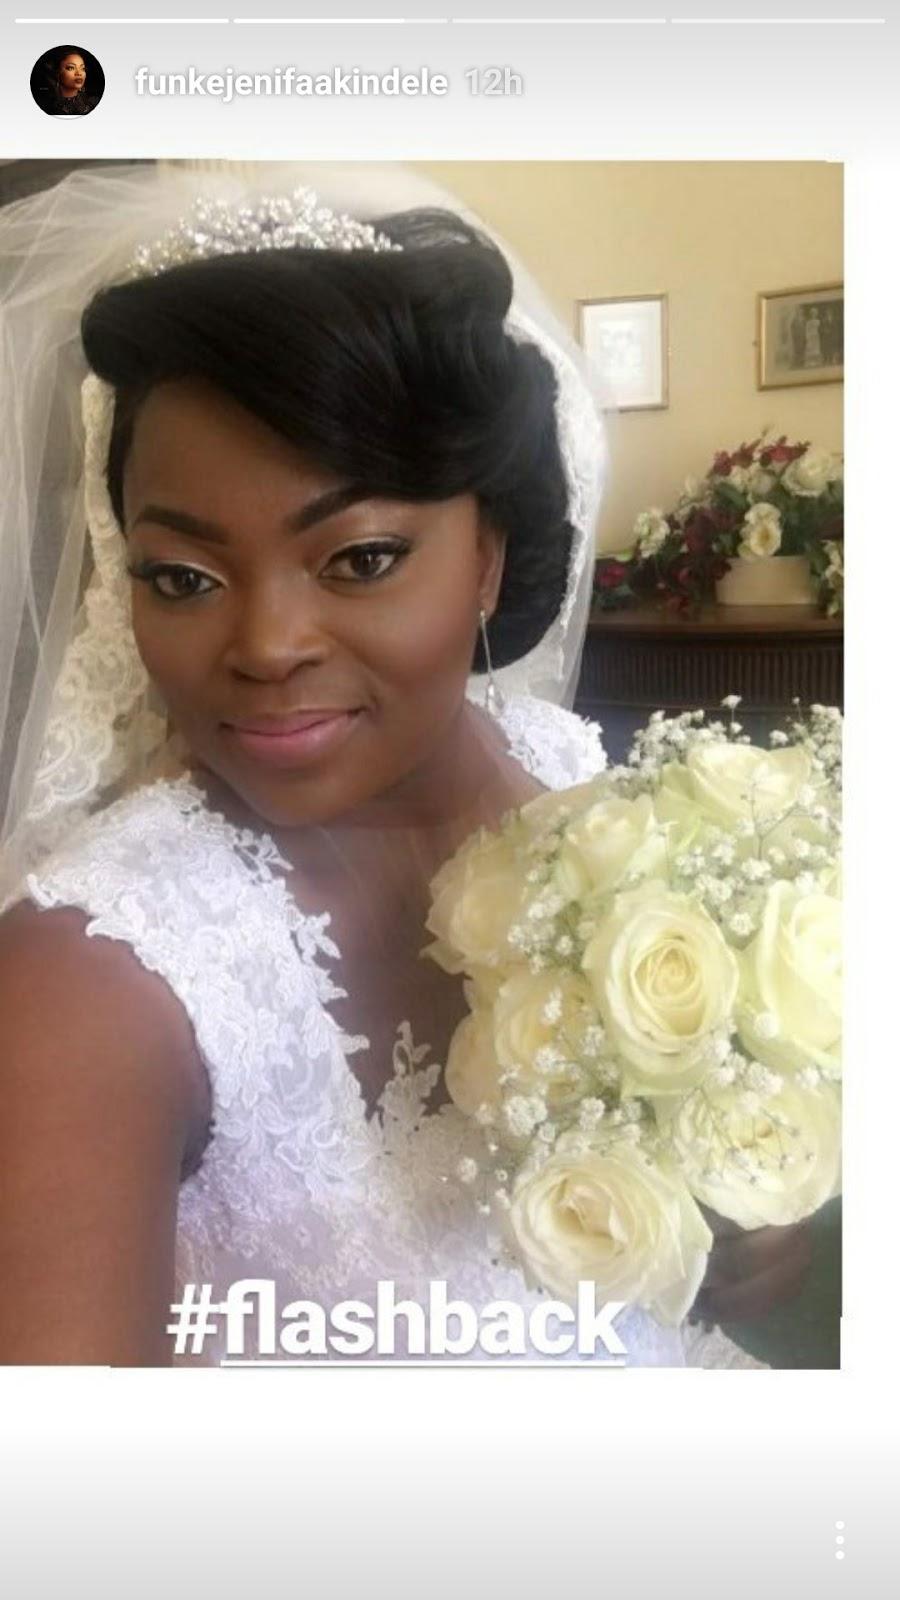 tkhd_exw Funke Akindele Bello Shares Throwback Photo From Her Wedding Day